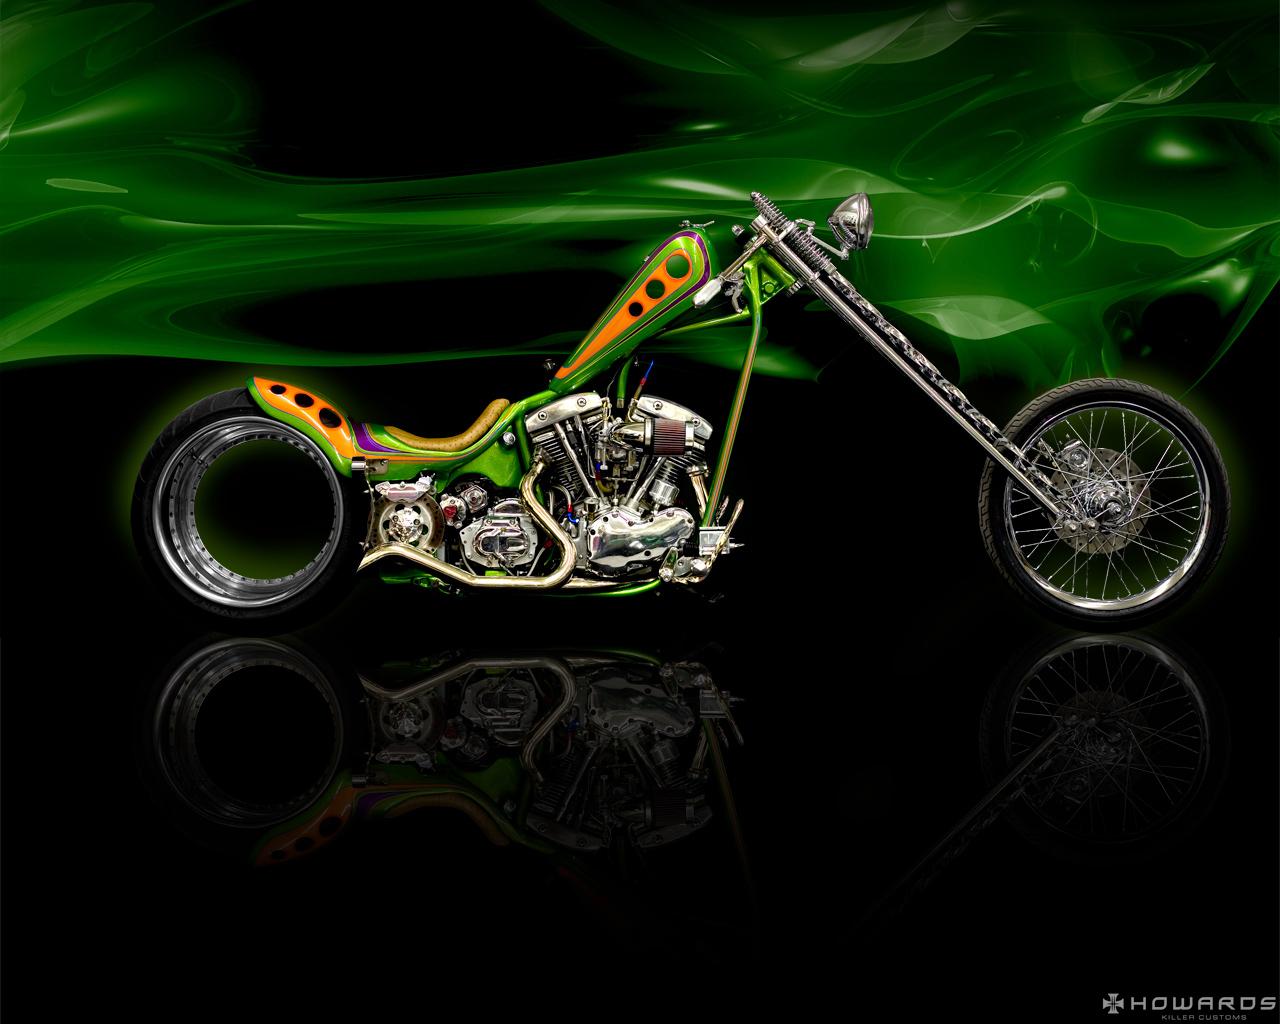 harley davidson motorcycle wallpapers motorcycle wallpaper harley 1280x1024